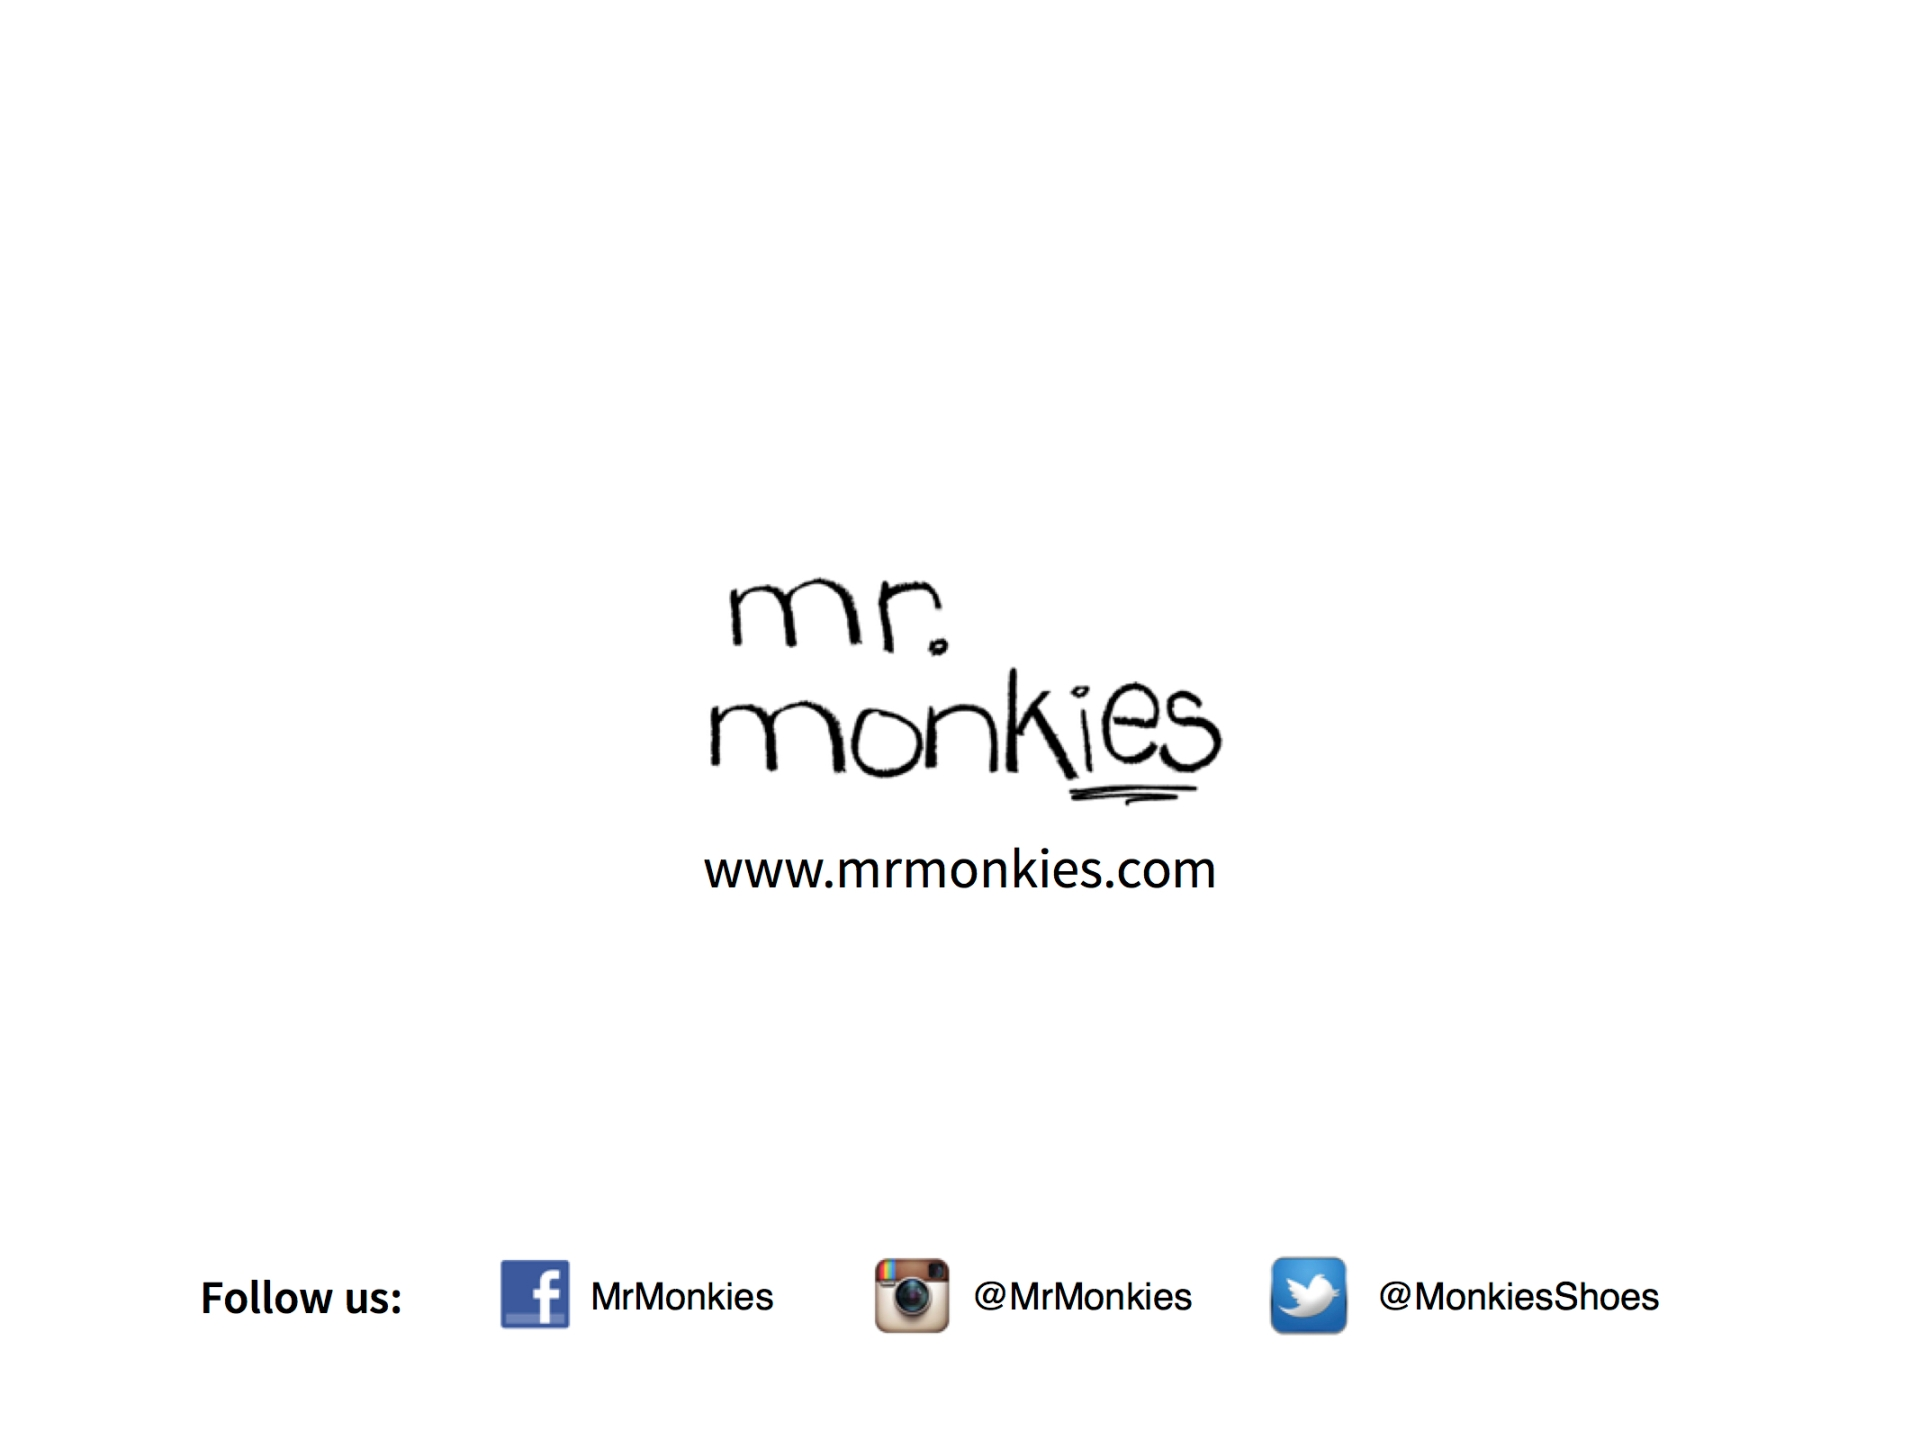 MrMonkies - Brand Intro 2016 9